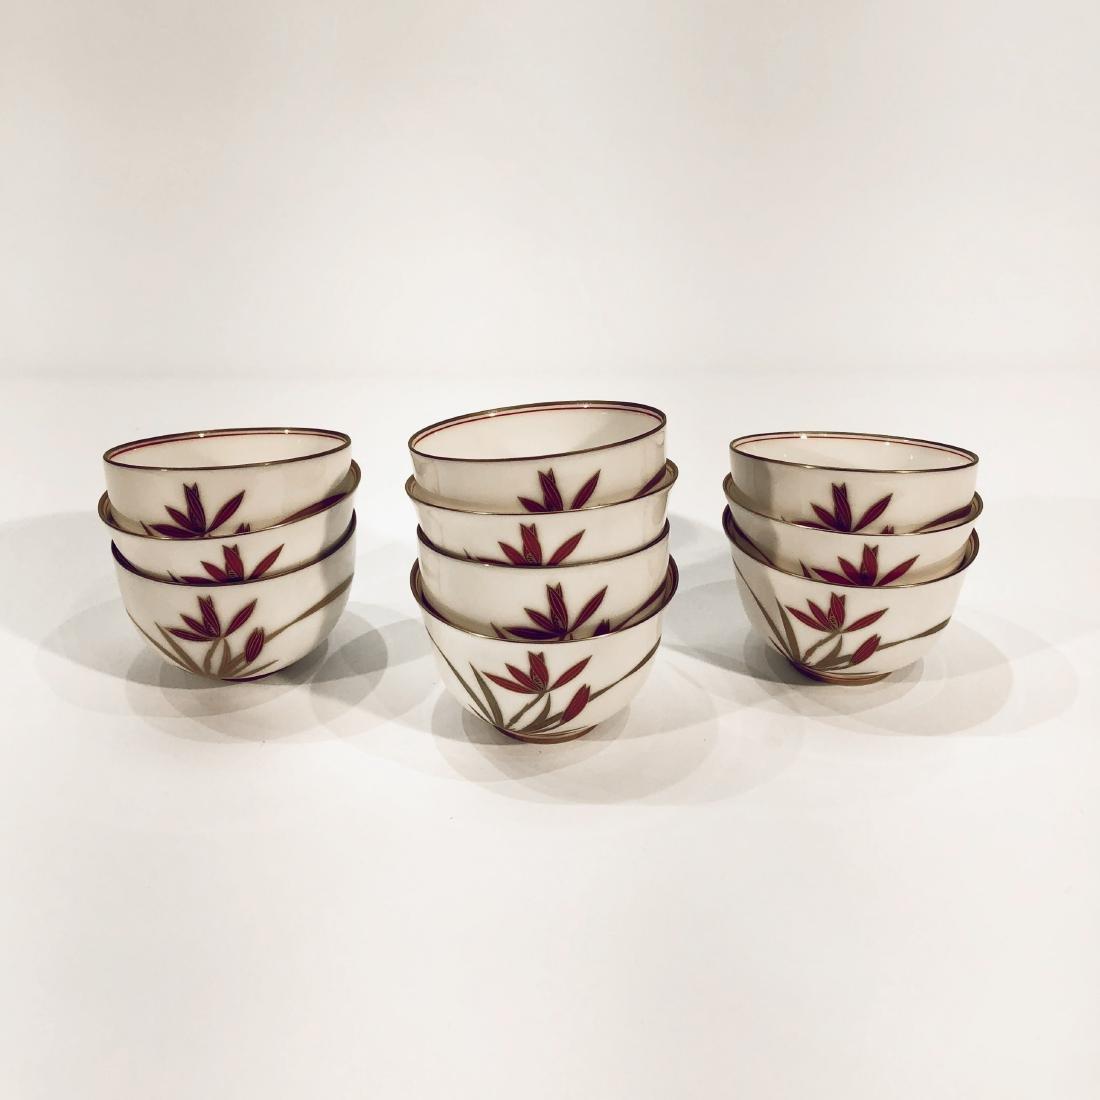 Set of 10 Japanese Porcelain Tea Cups